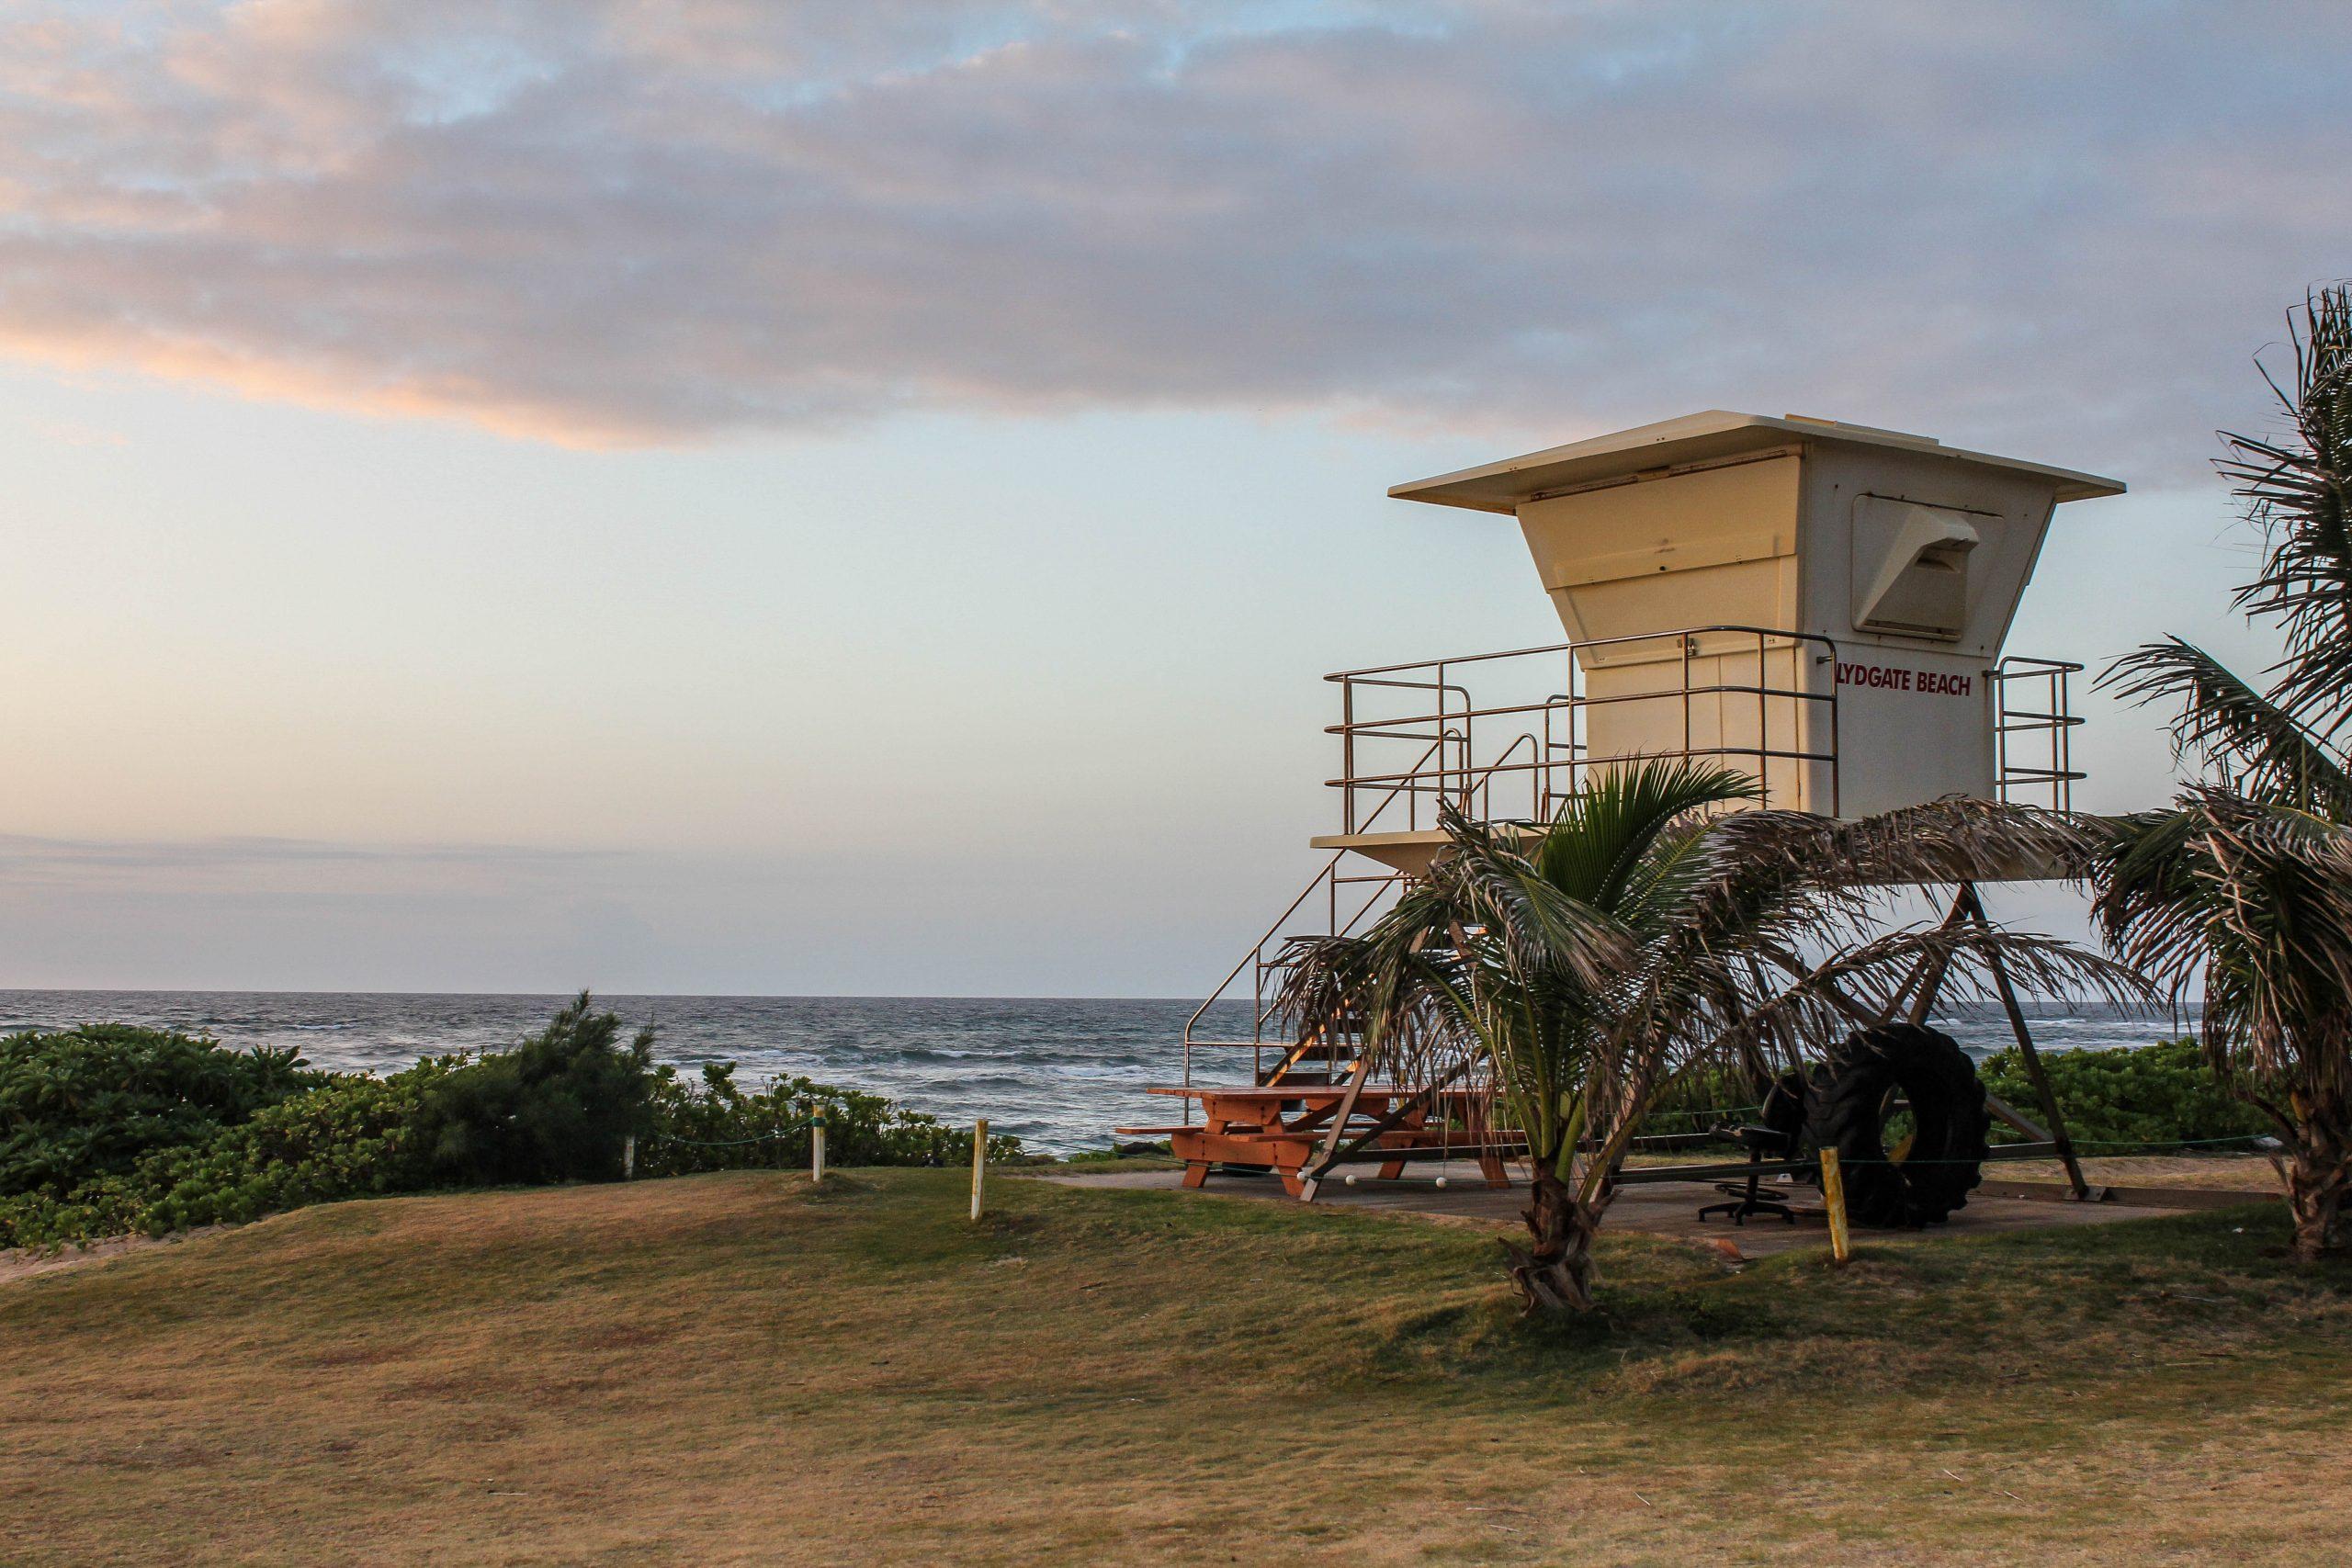 Lydgate State Park Beach, Kauai, Hawaii USA